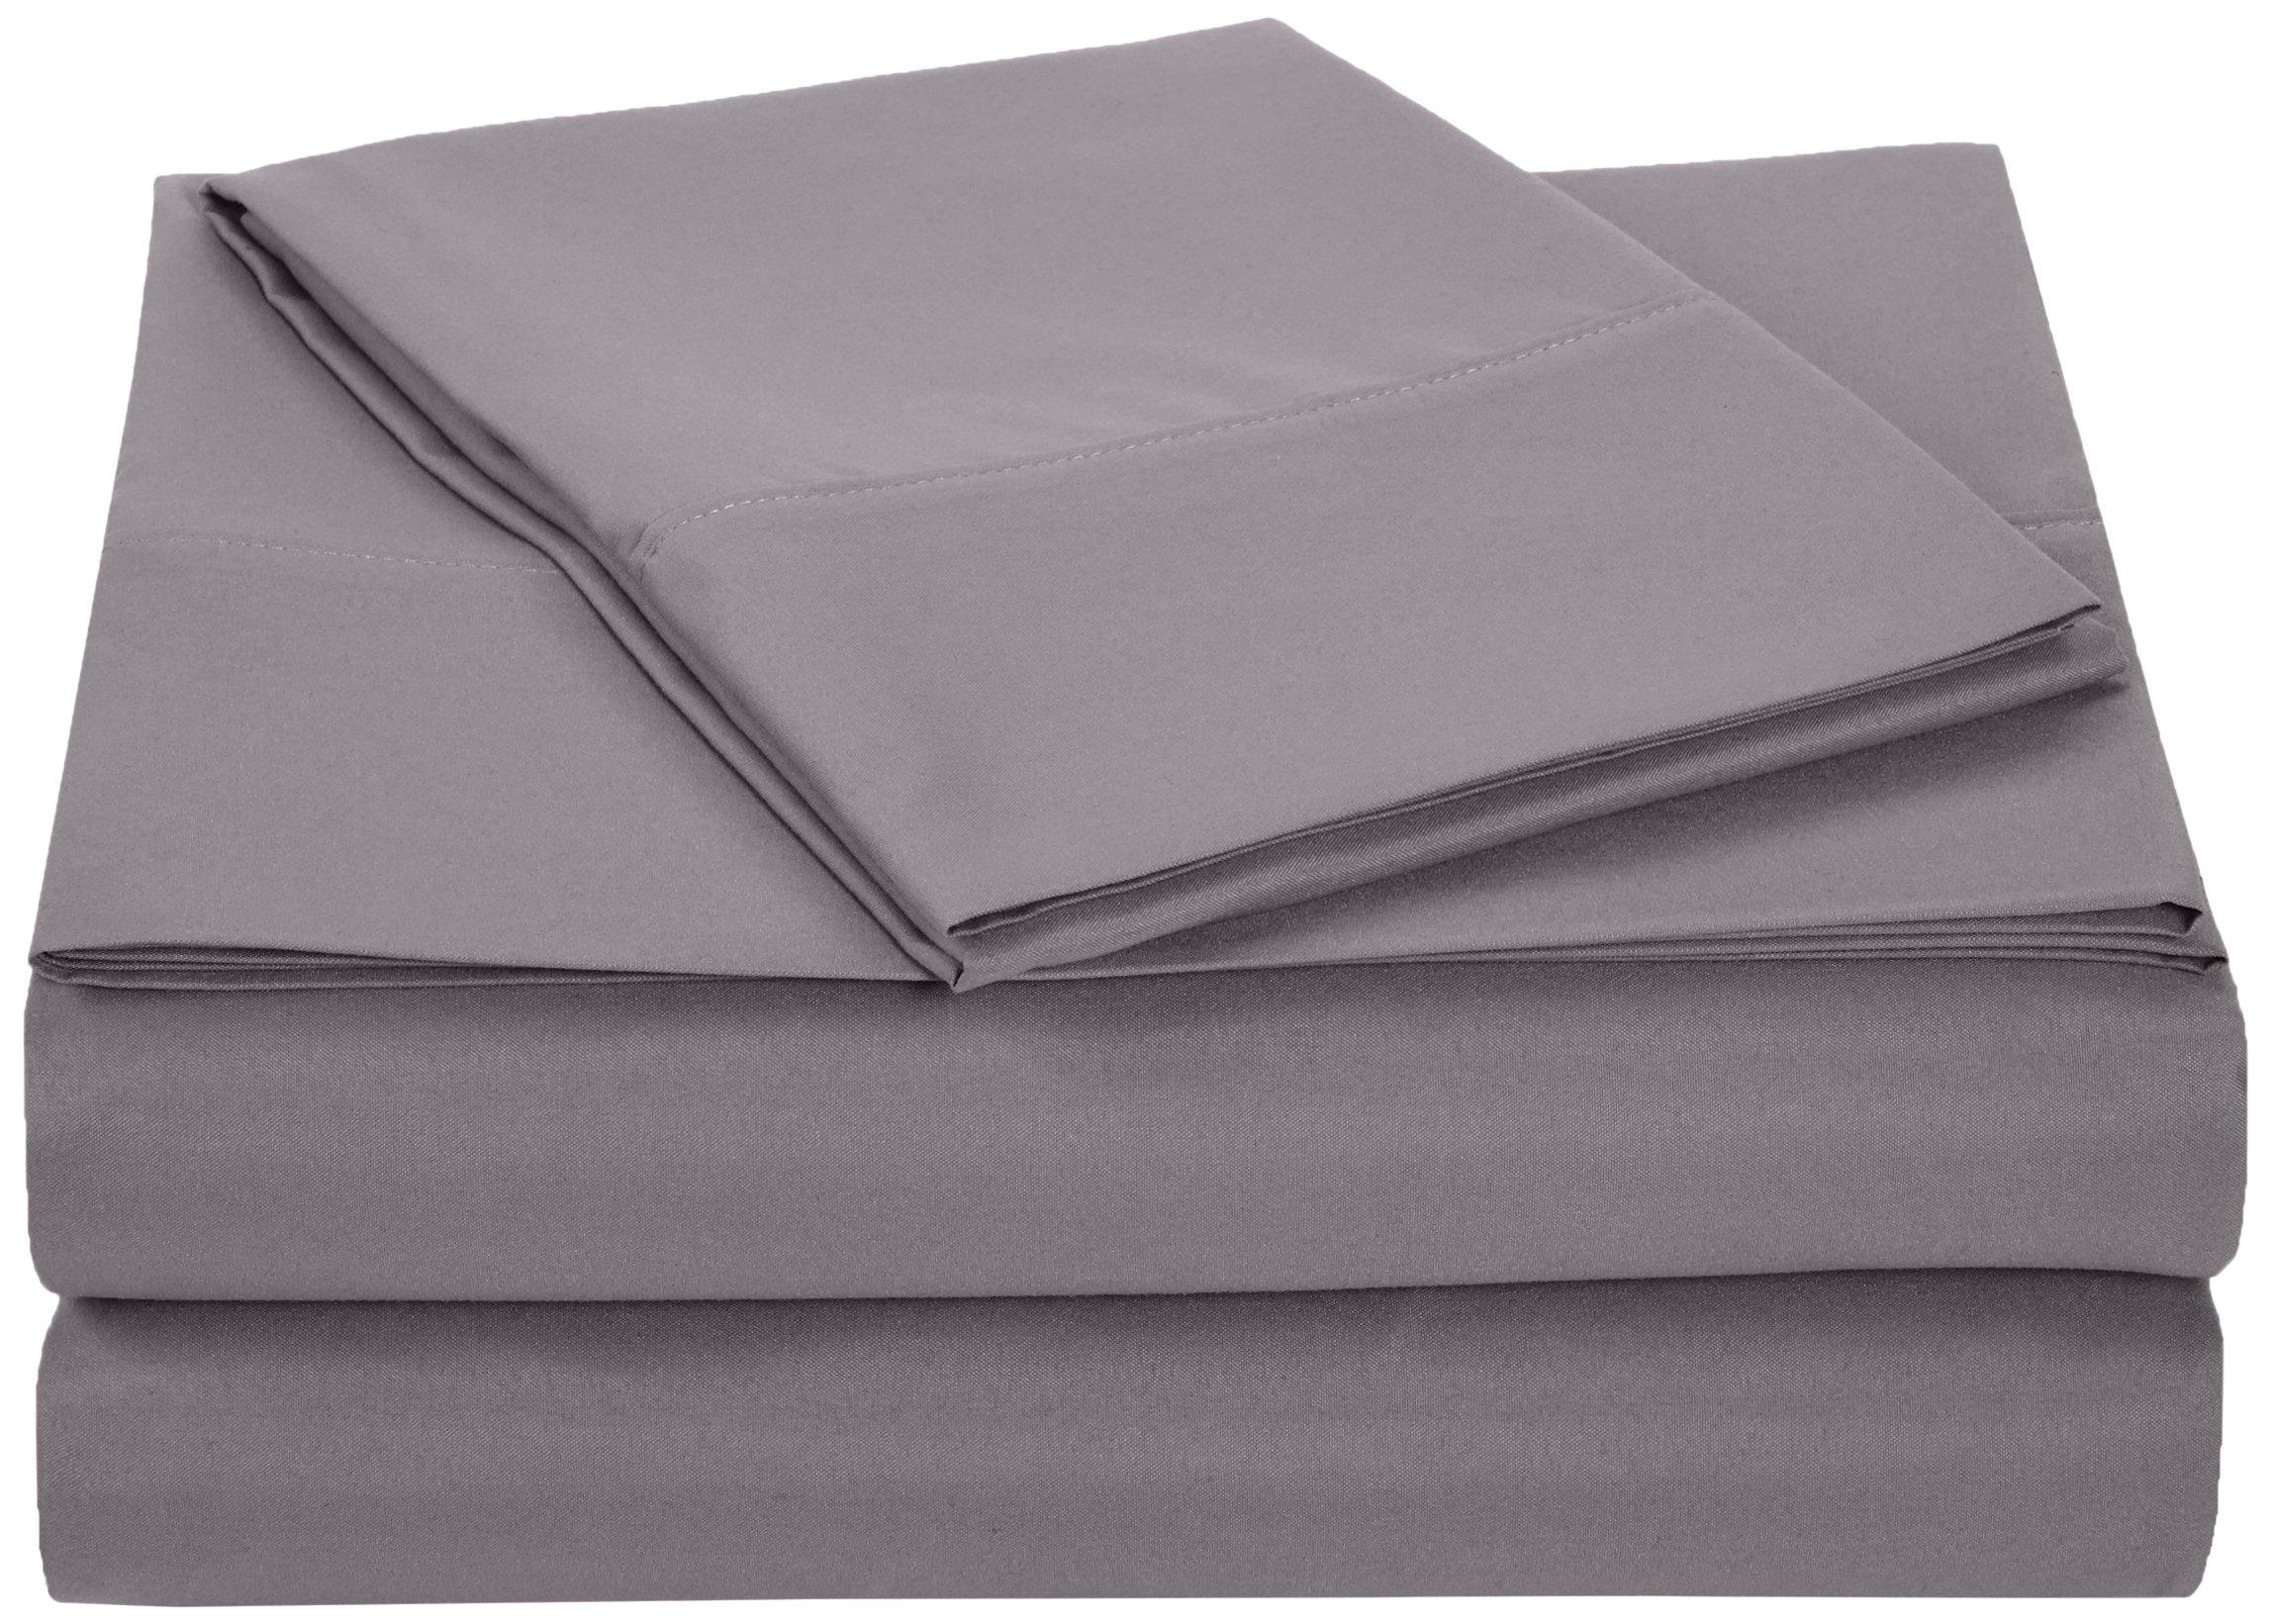 amazonbasics microfiber sheet set twin extra long dark grey twin xl ebay. Black Bedroom Furniture Sets. Home Design Ideas